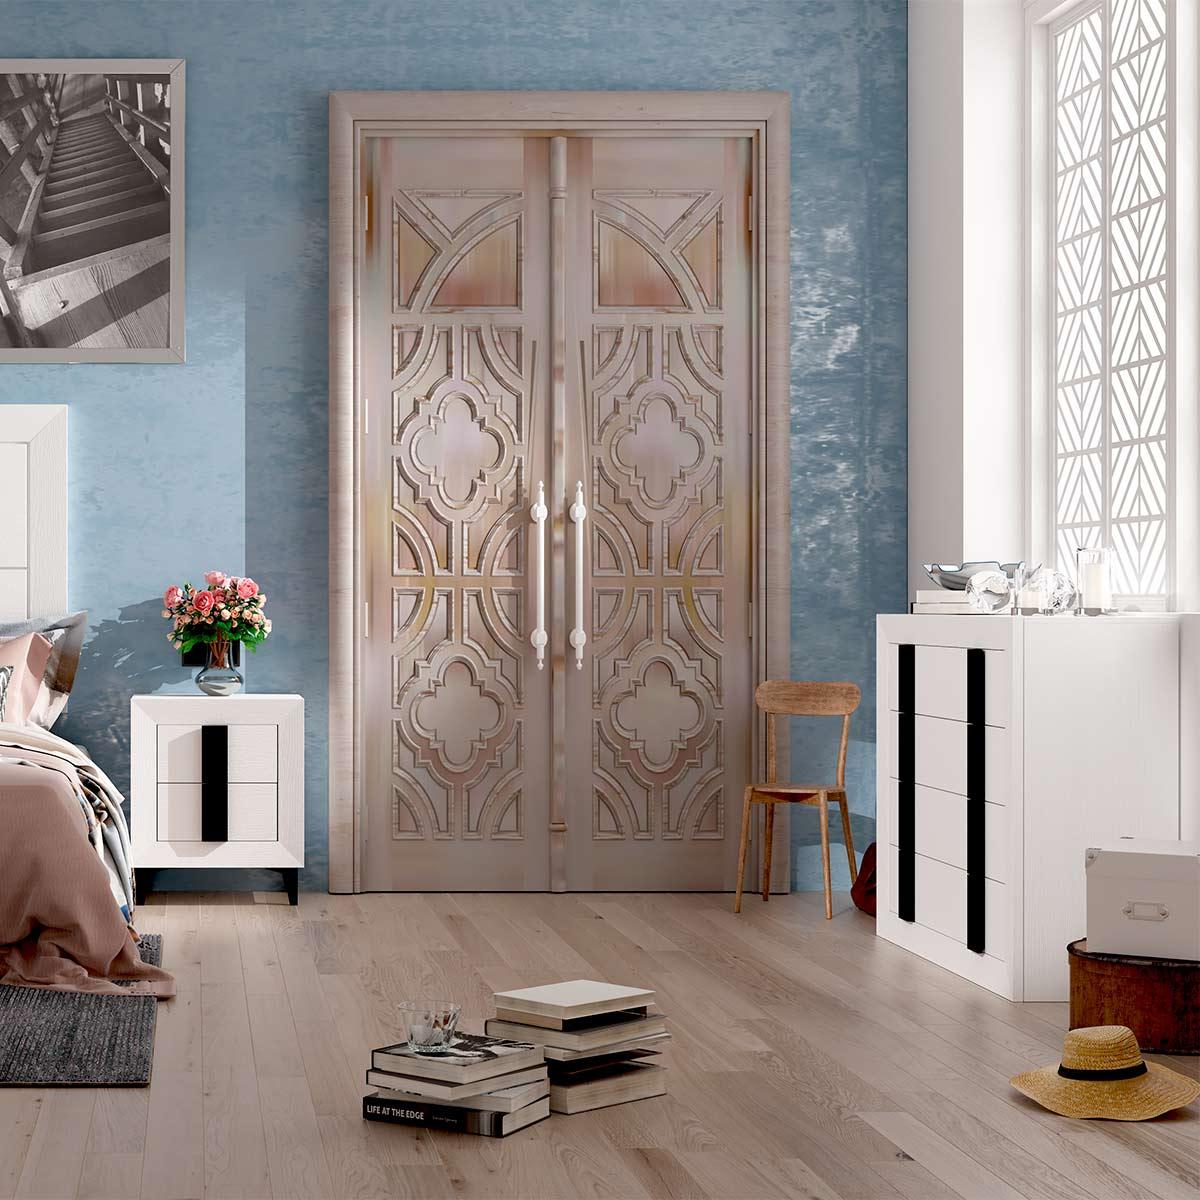 Dormitorio de matrimonio Viena 01 comoda